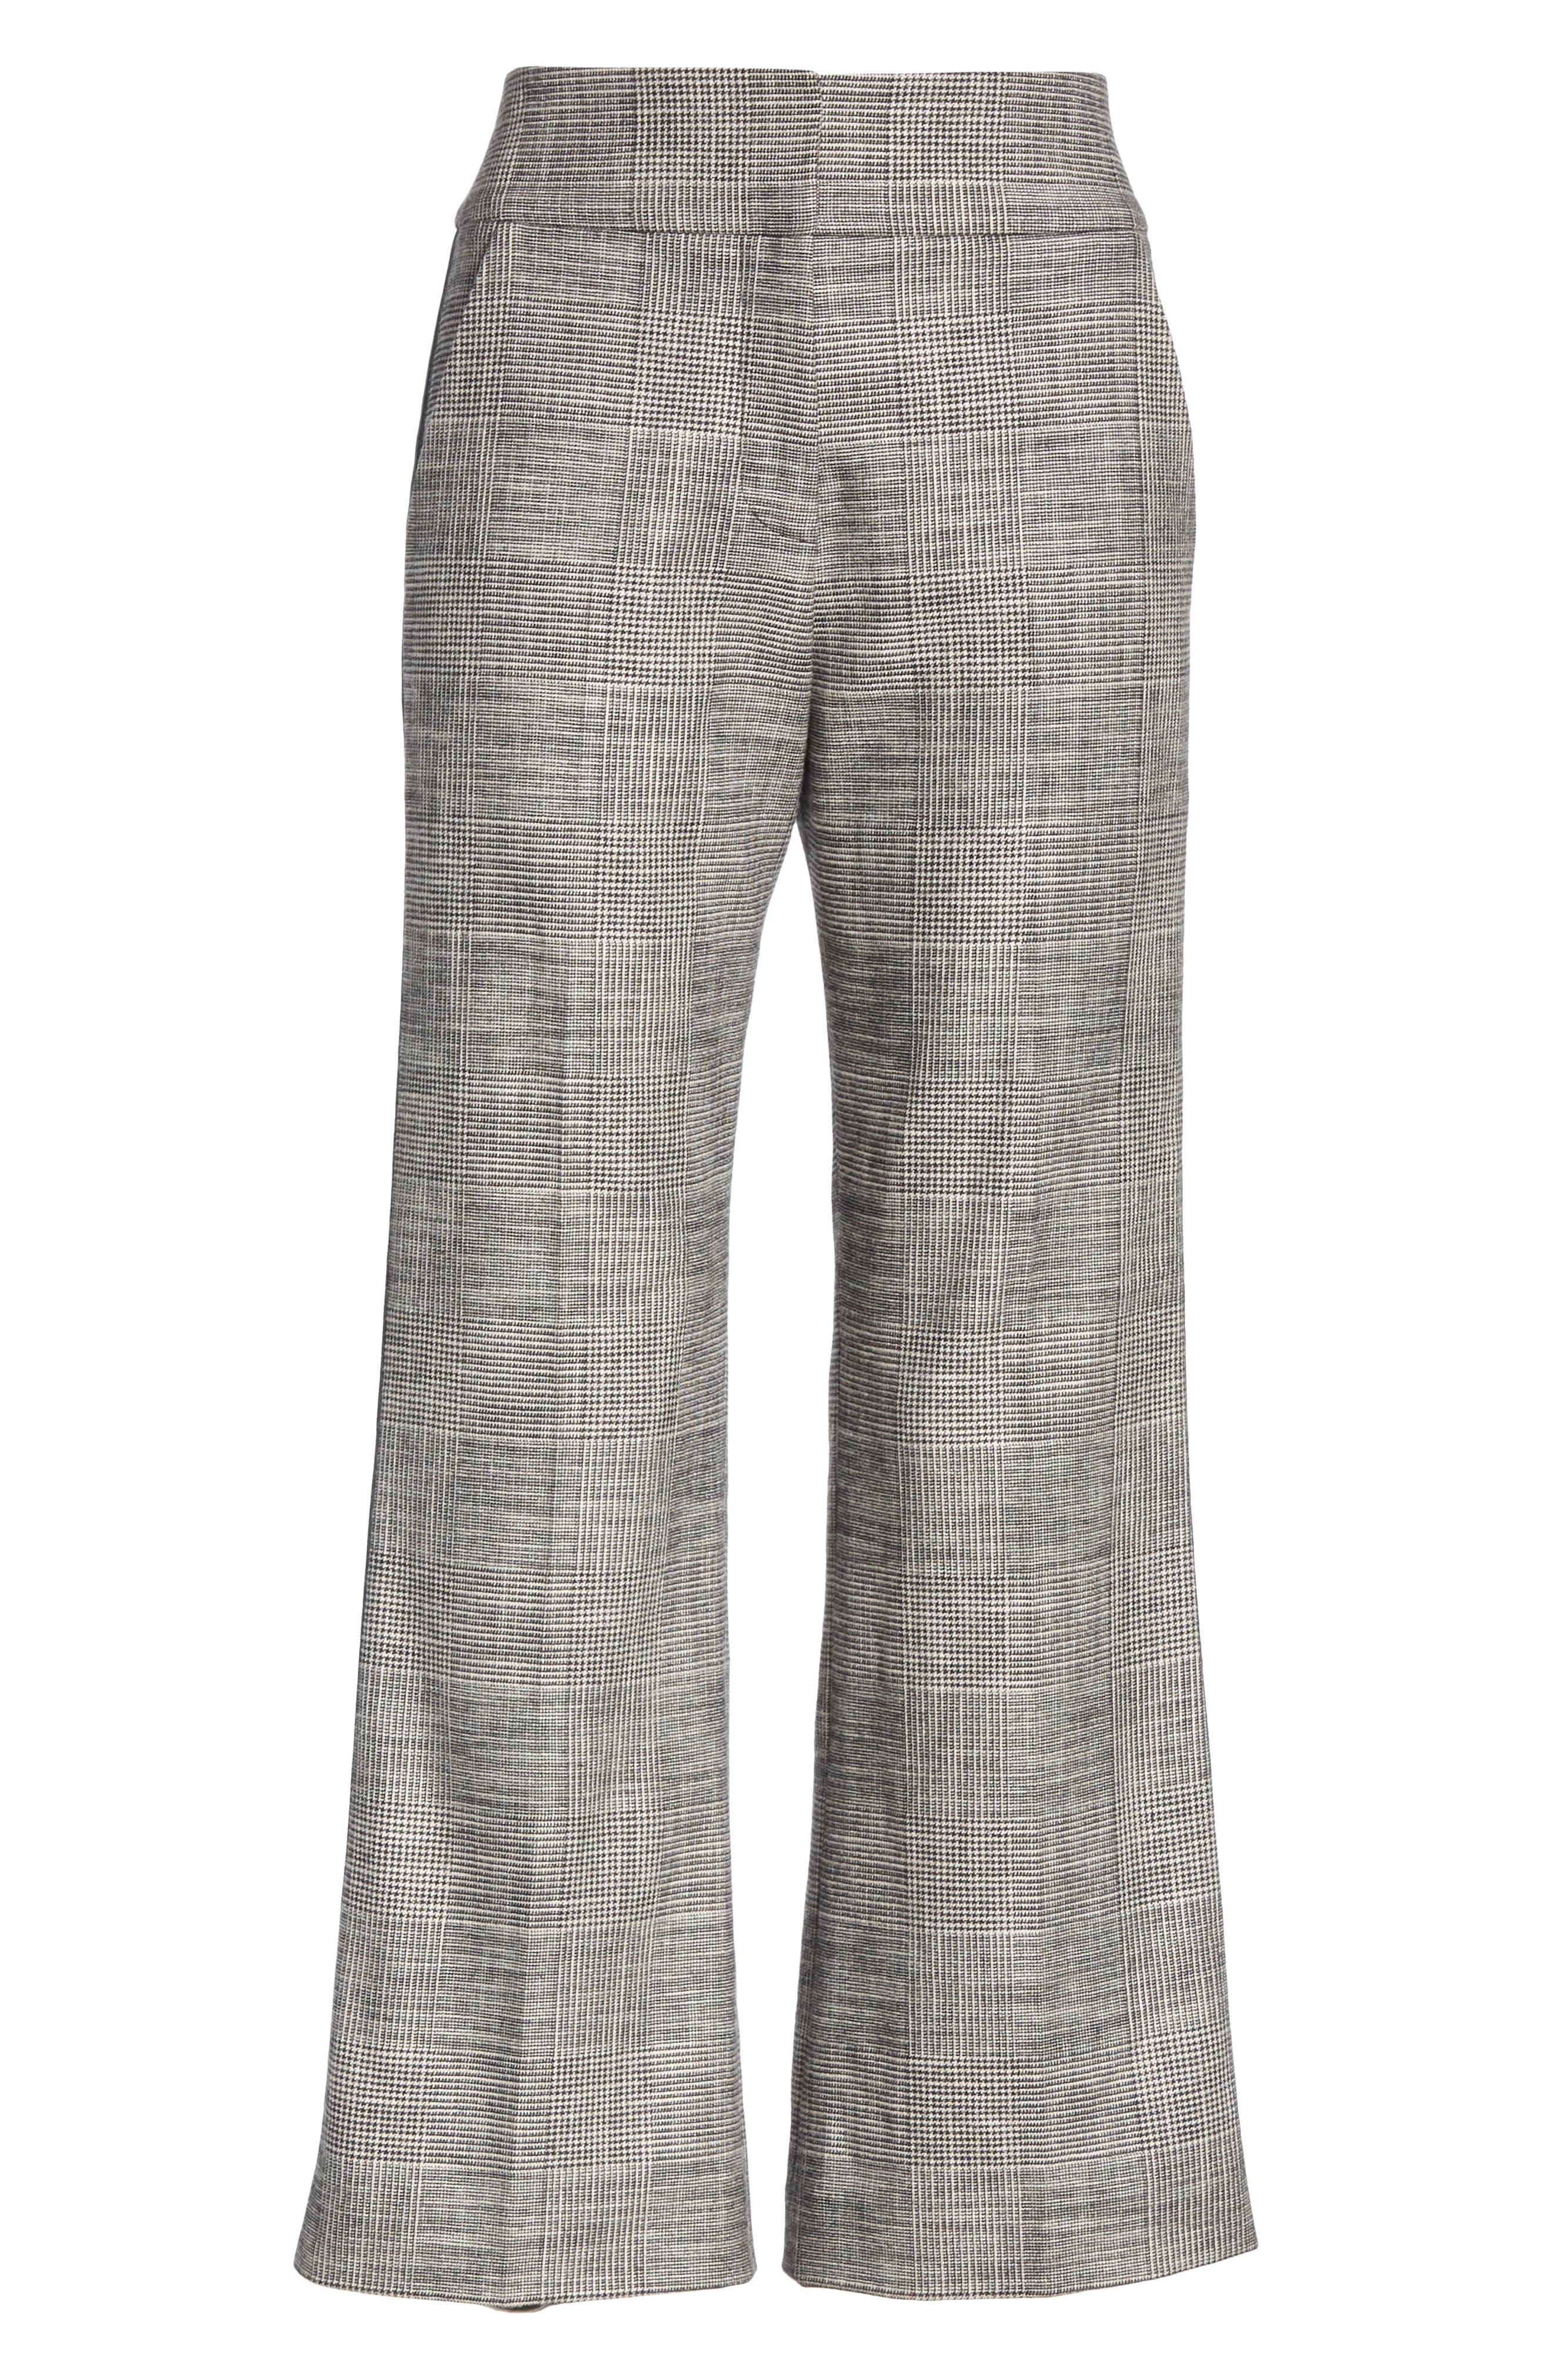 Cormac Side Stripe Check Trousers,                             Alternate thumbnail 6, color,                             020